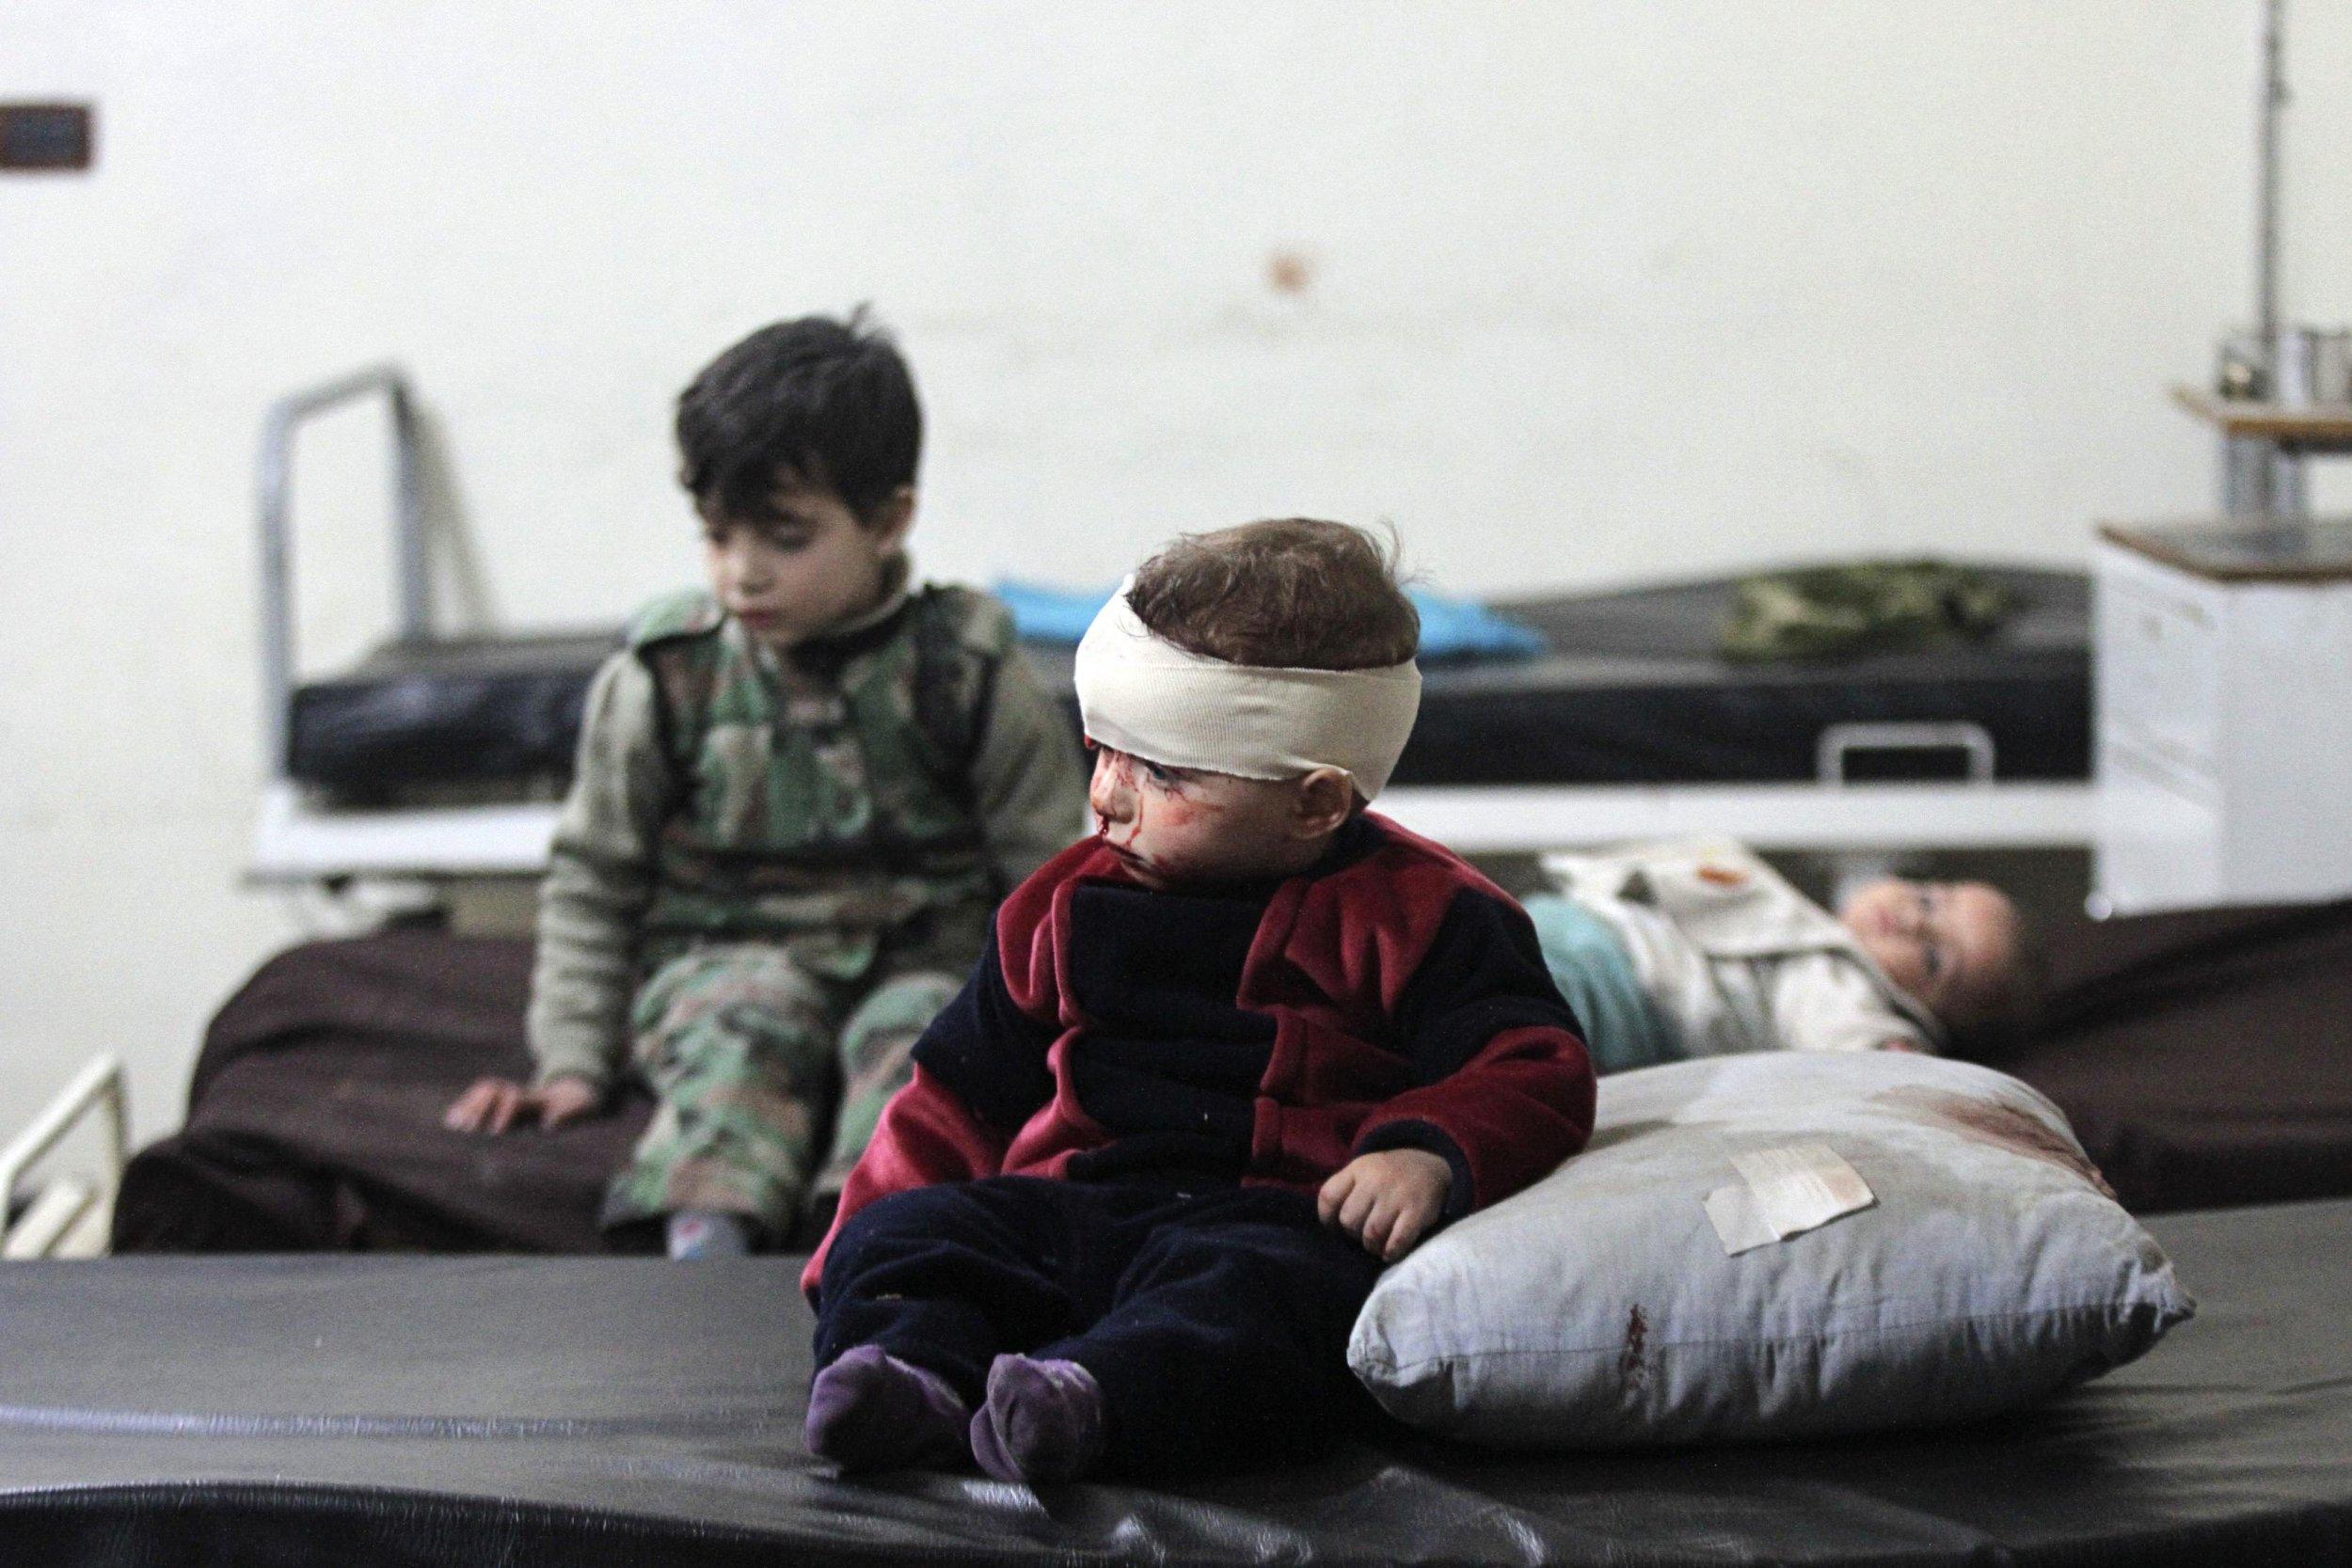 2015-01-25T181941Z_535236540_GM1EB1Q06BY01_RTRMADP_3_SYRIA-CRISIS